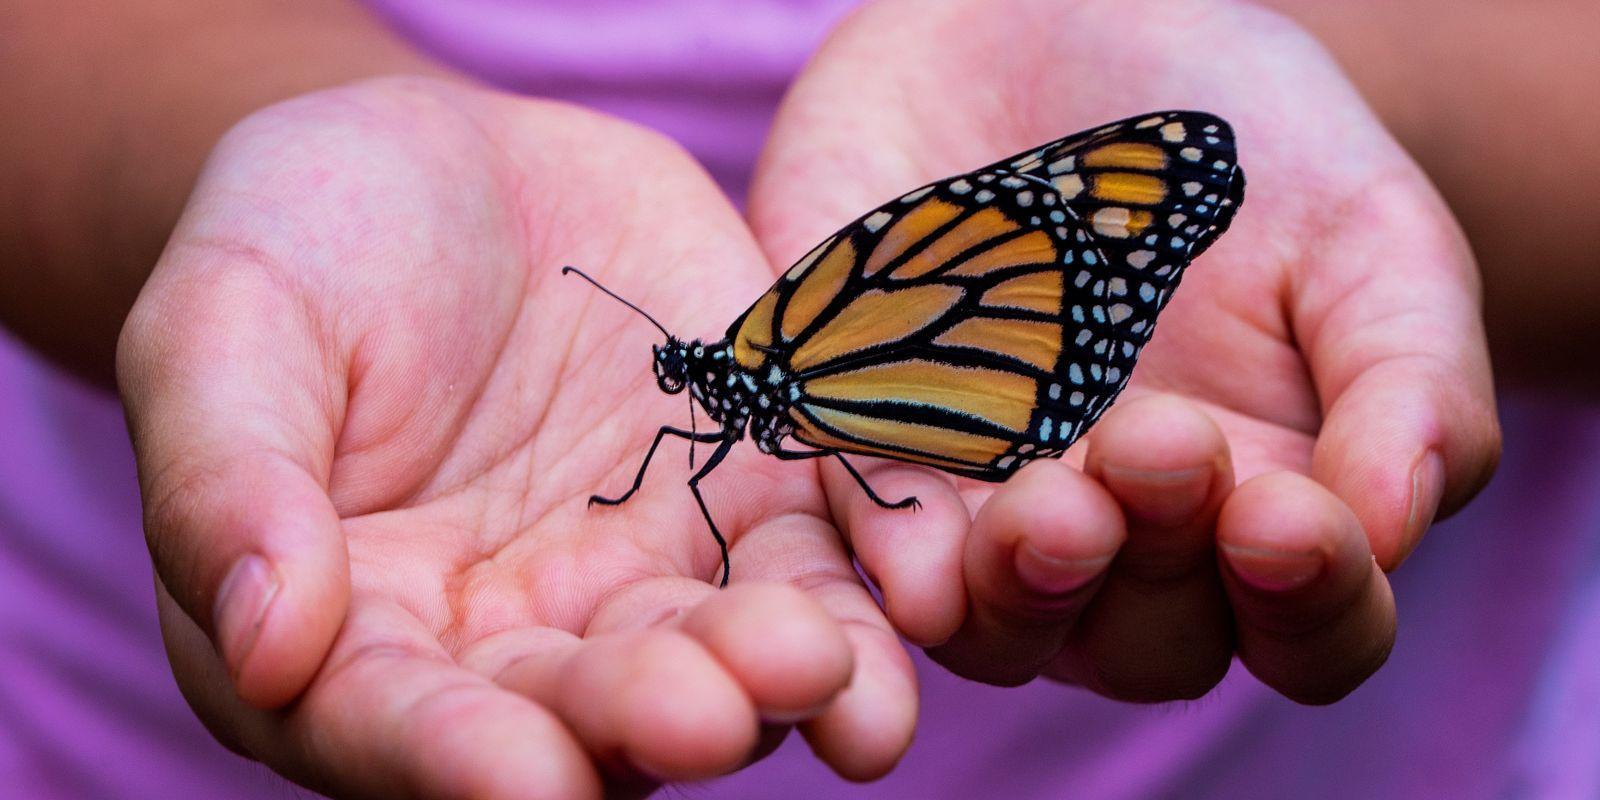 Farfalla - krása na křídlech motýlů